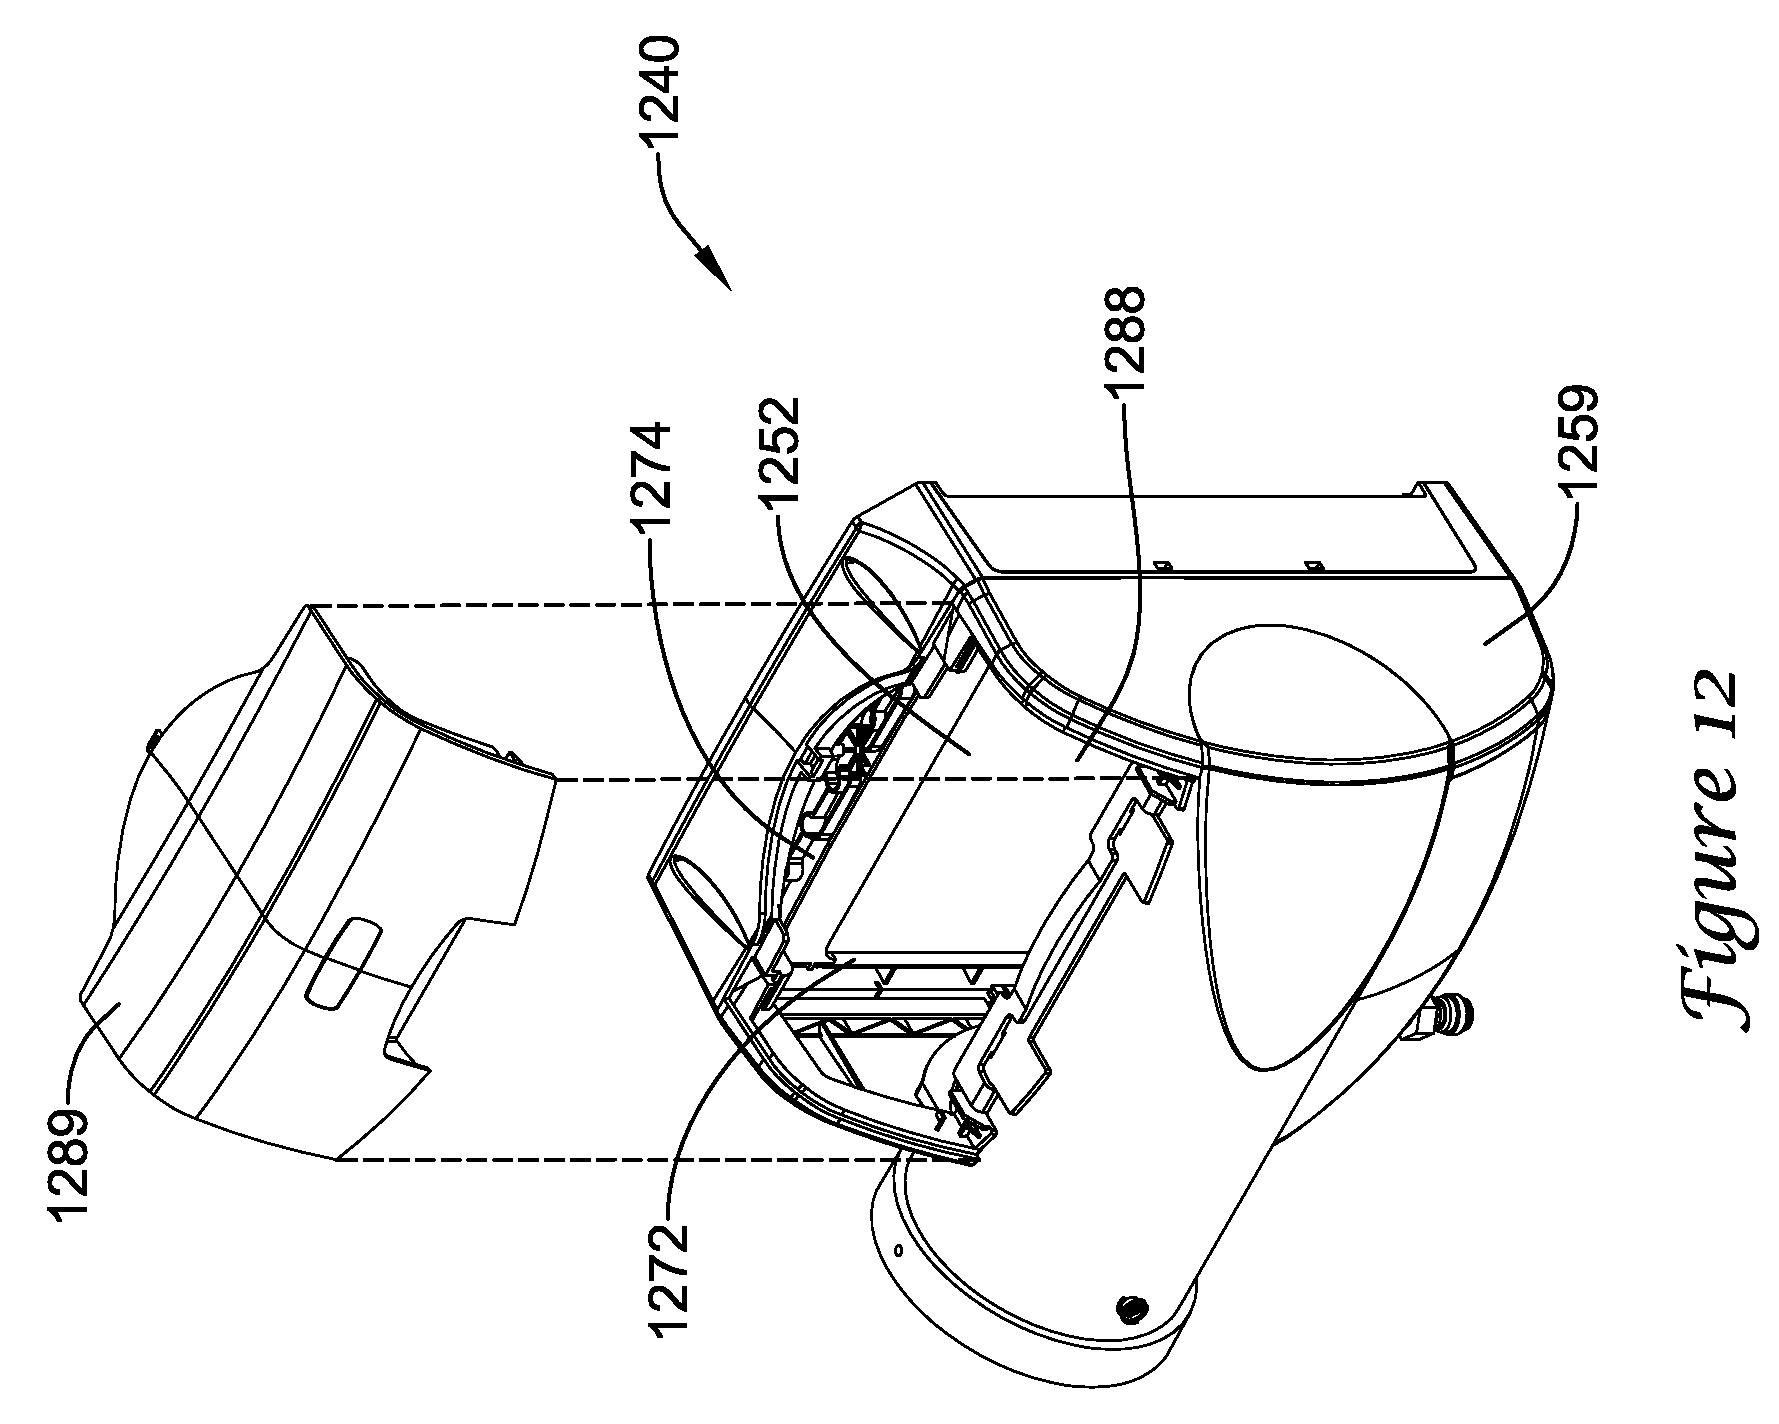 Hvac Duct Drawing Image | Wiring Diagram Database